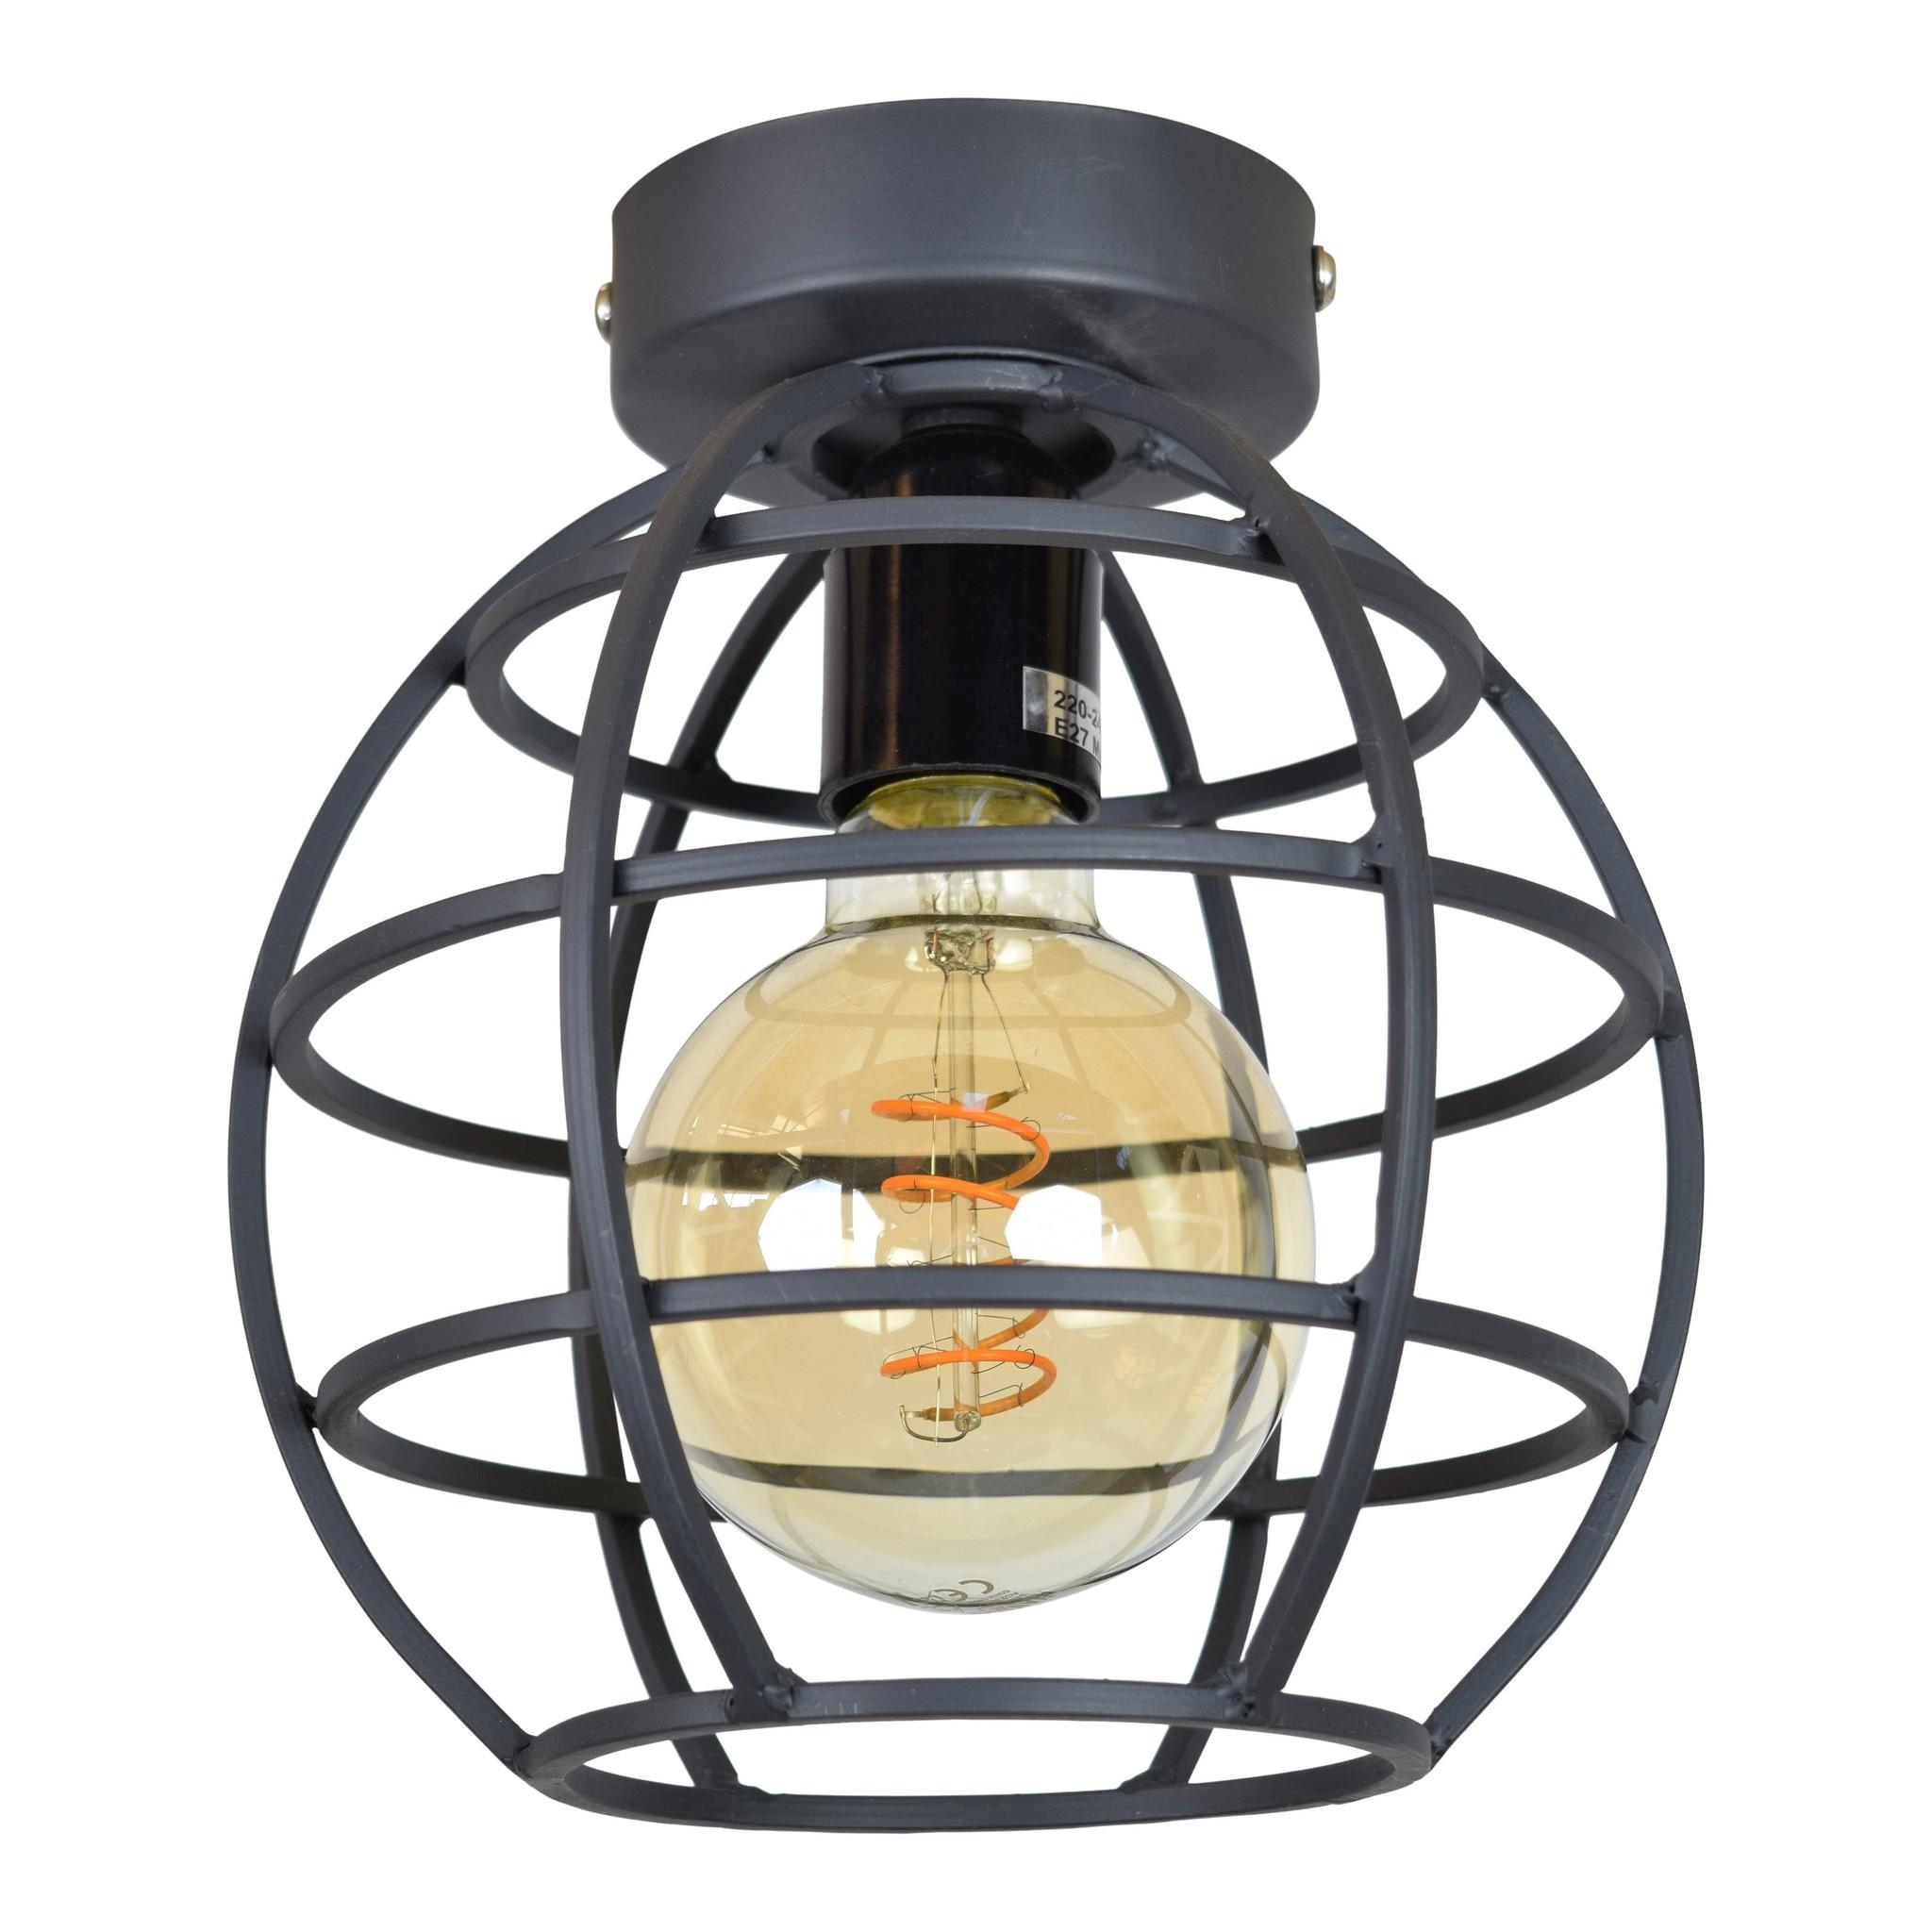 Urban Interiors Plafondlamp Globe small Ø 19 cm Zwart